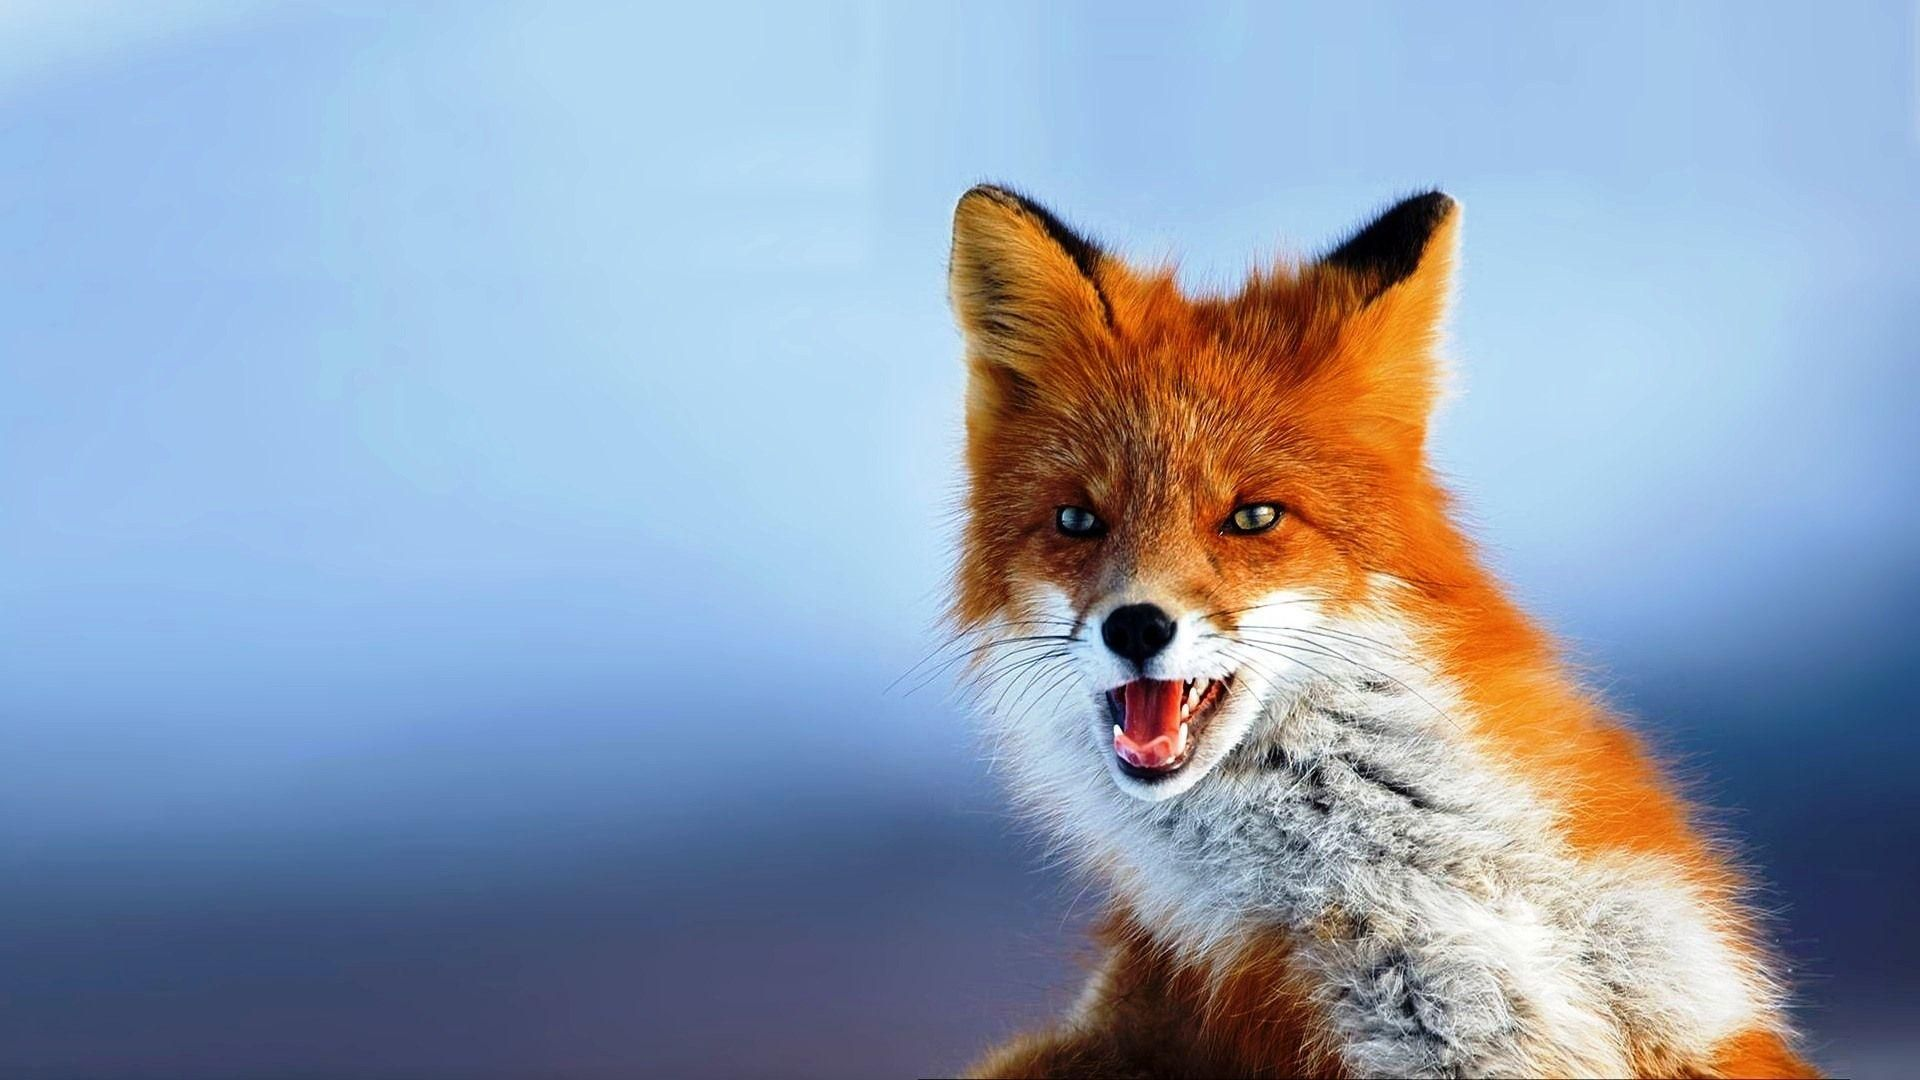 Fox Face Photo